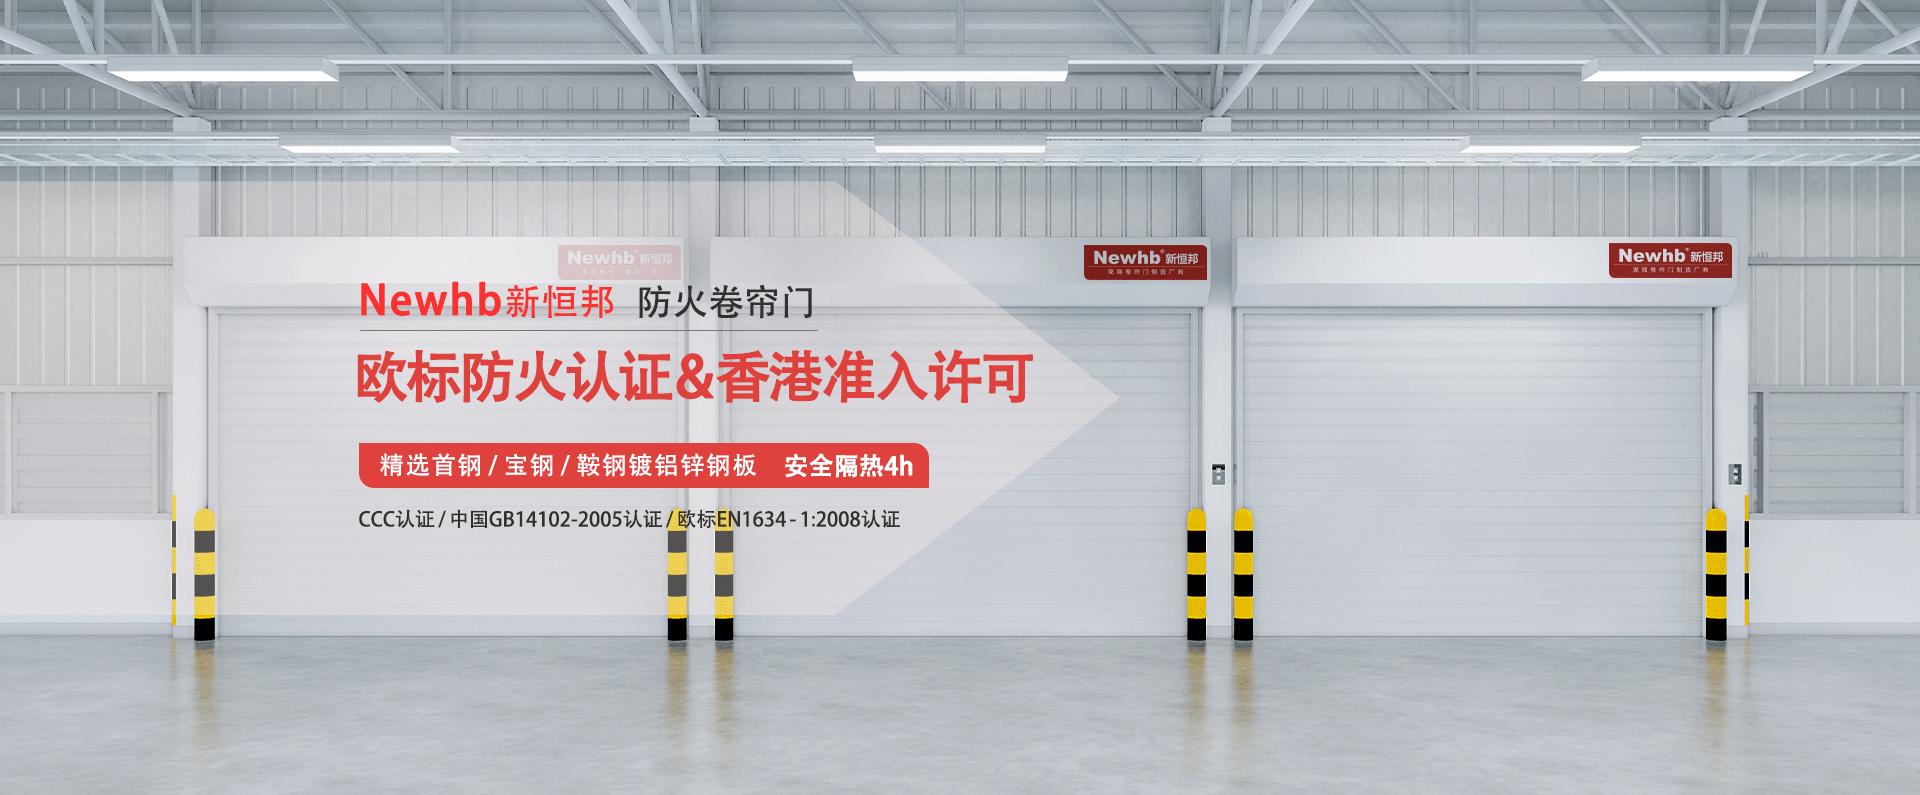 Newhb新恒邦防火卷帘门欧标防火认证&香港准入许可,精选首钢宝钢鞍钢镀铝锌钢板,安全隔热4h